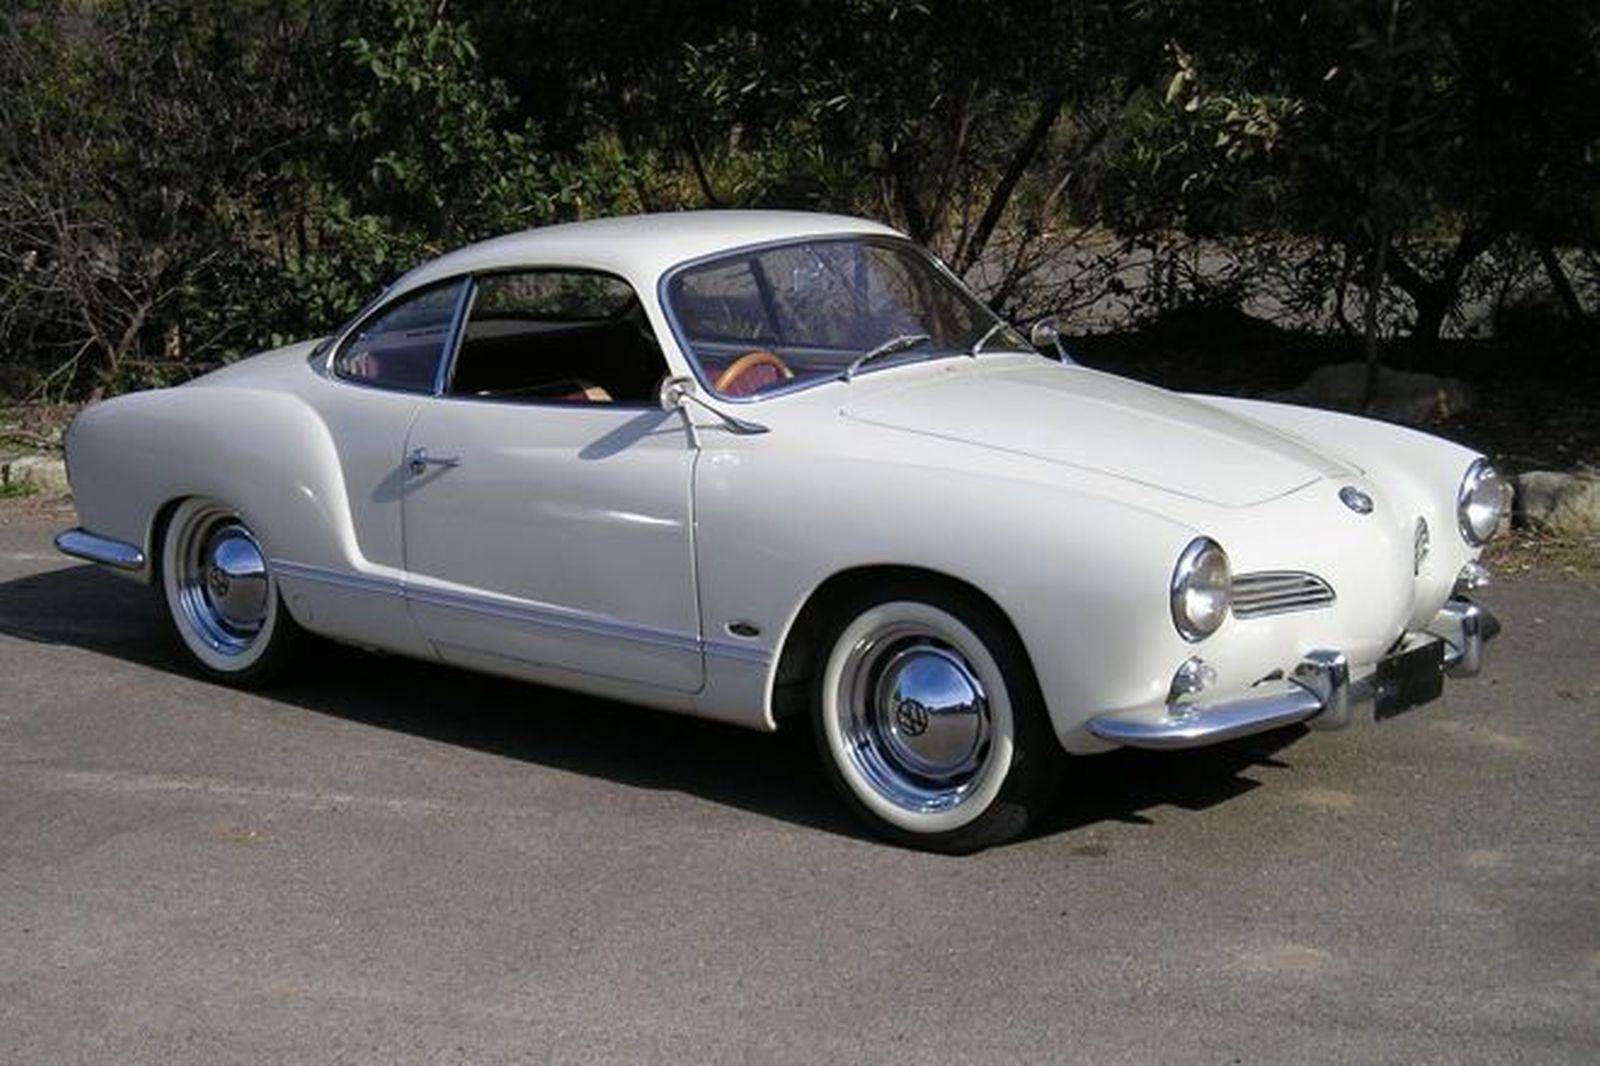 1961-volkswagen-karmann-ghia-coupe